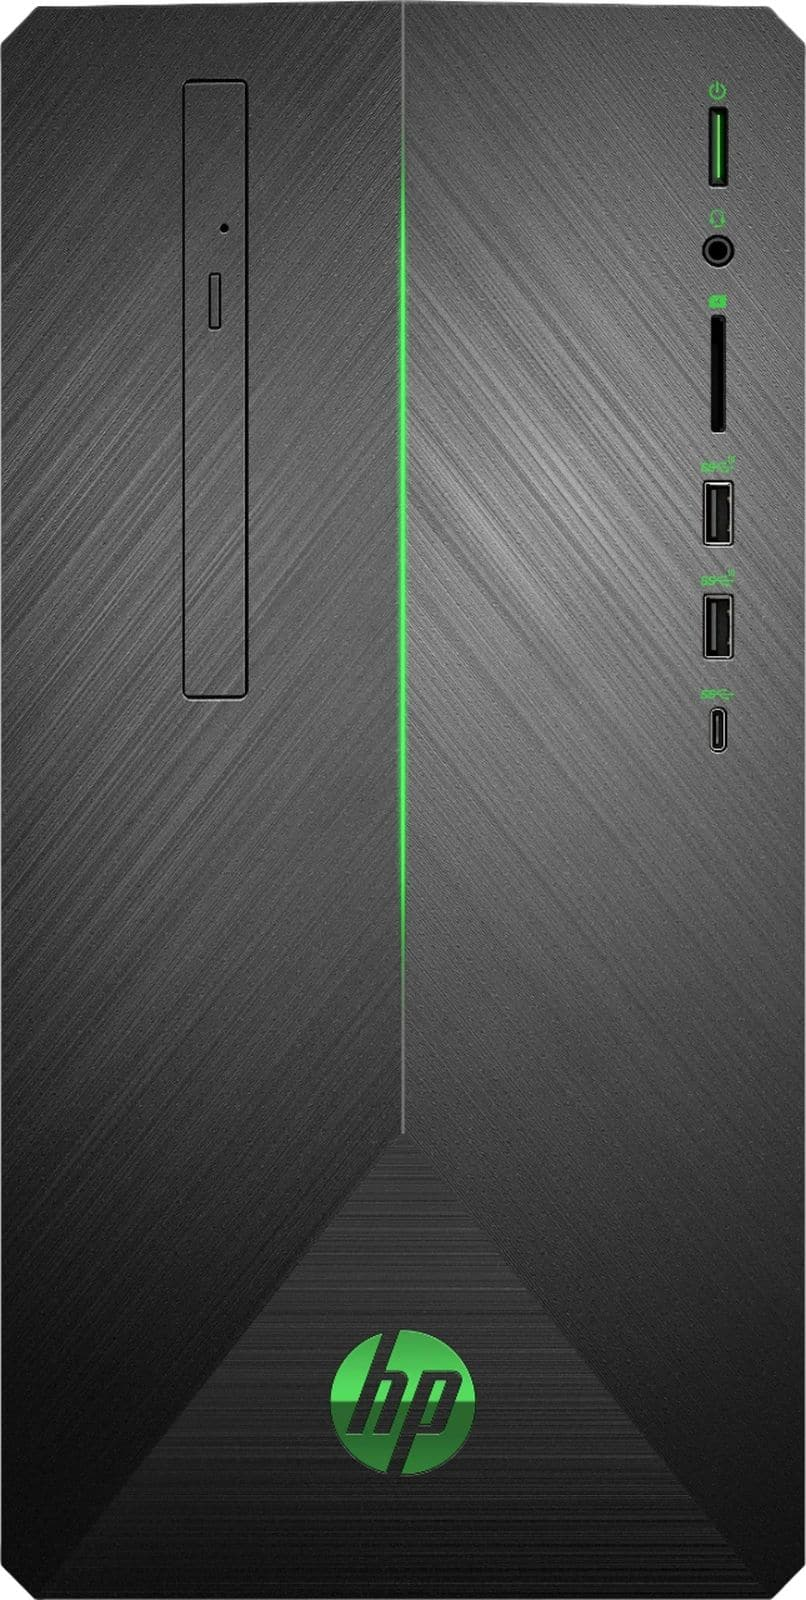 HP Pavilion Desktop: Ryzen 5 2400G, 8GB DDR4, 1TB HDD + 128GB SSD, RX 580 4GB, Win 10 $499.99 + Free Shipping @ Best Buy